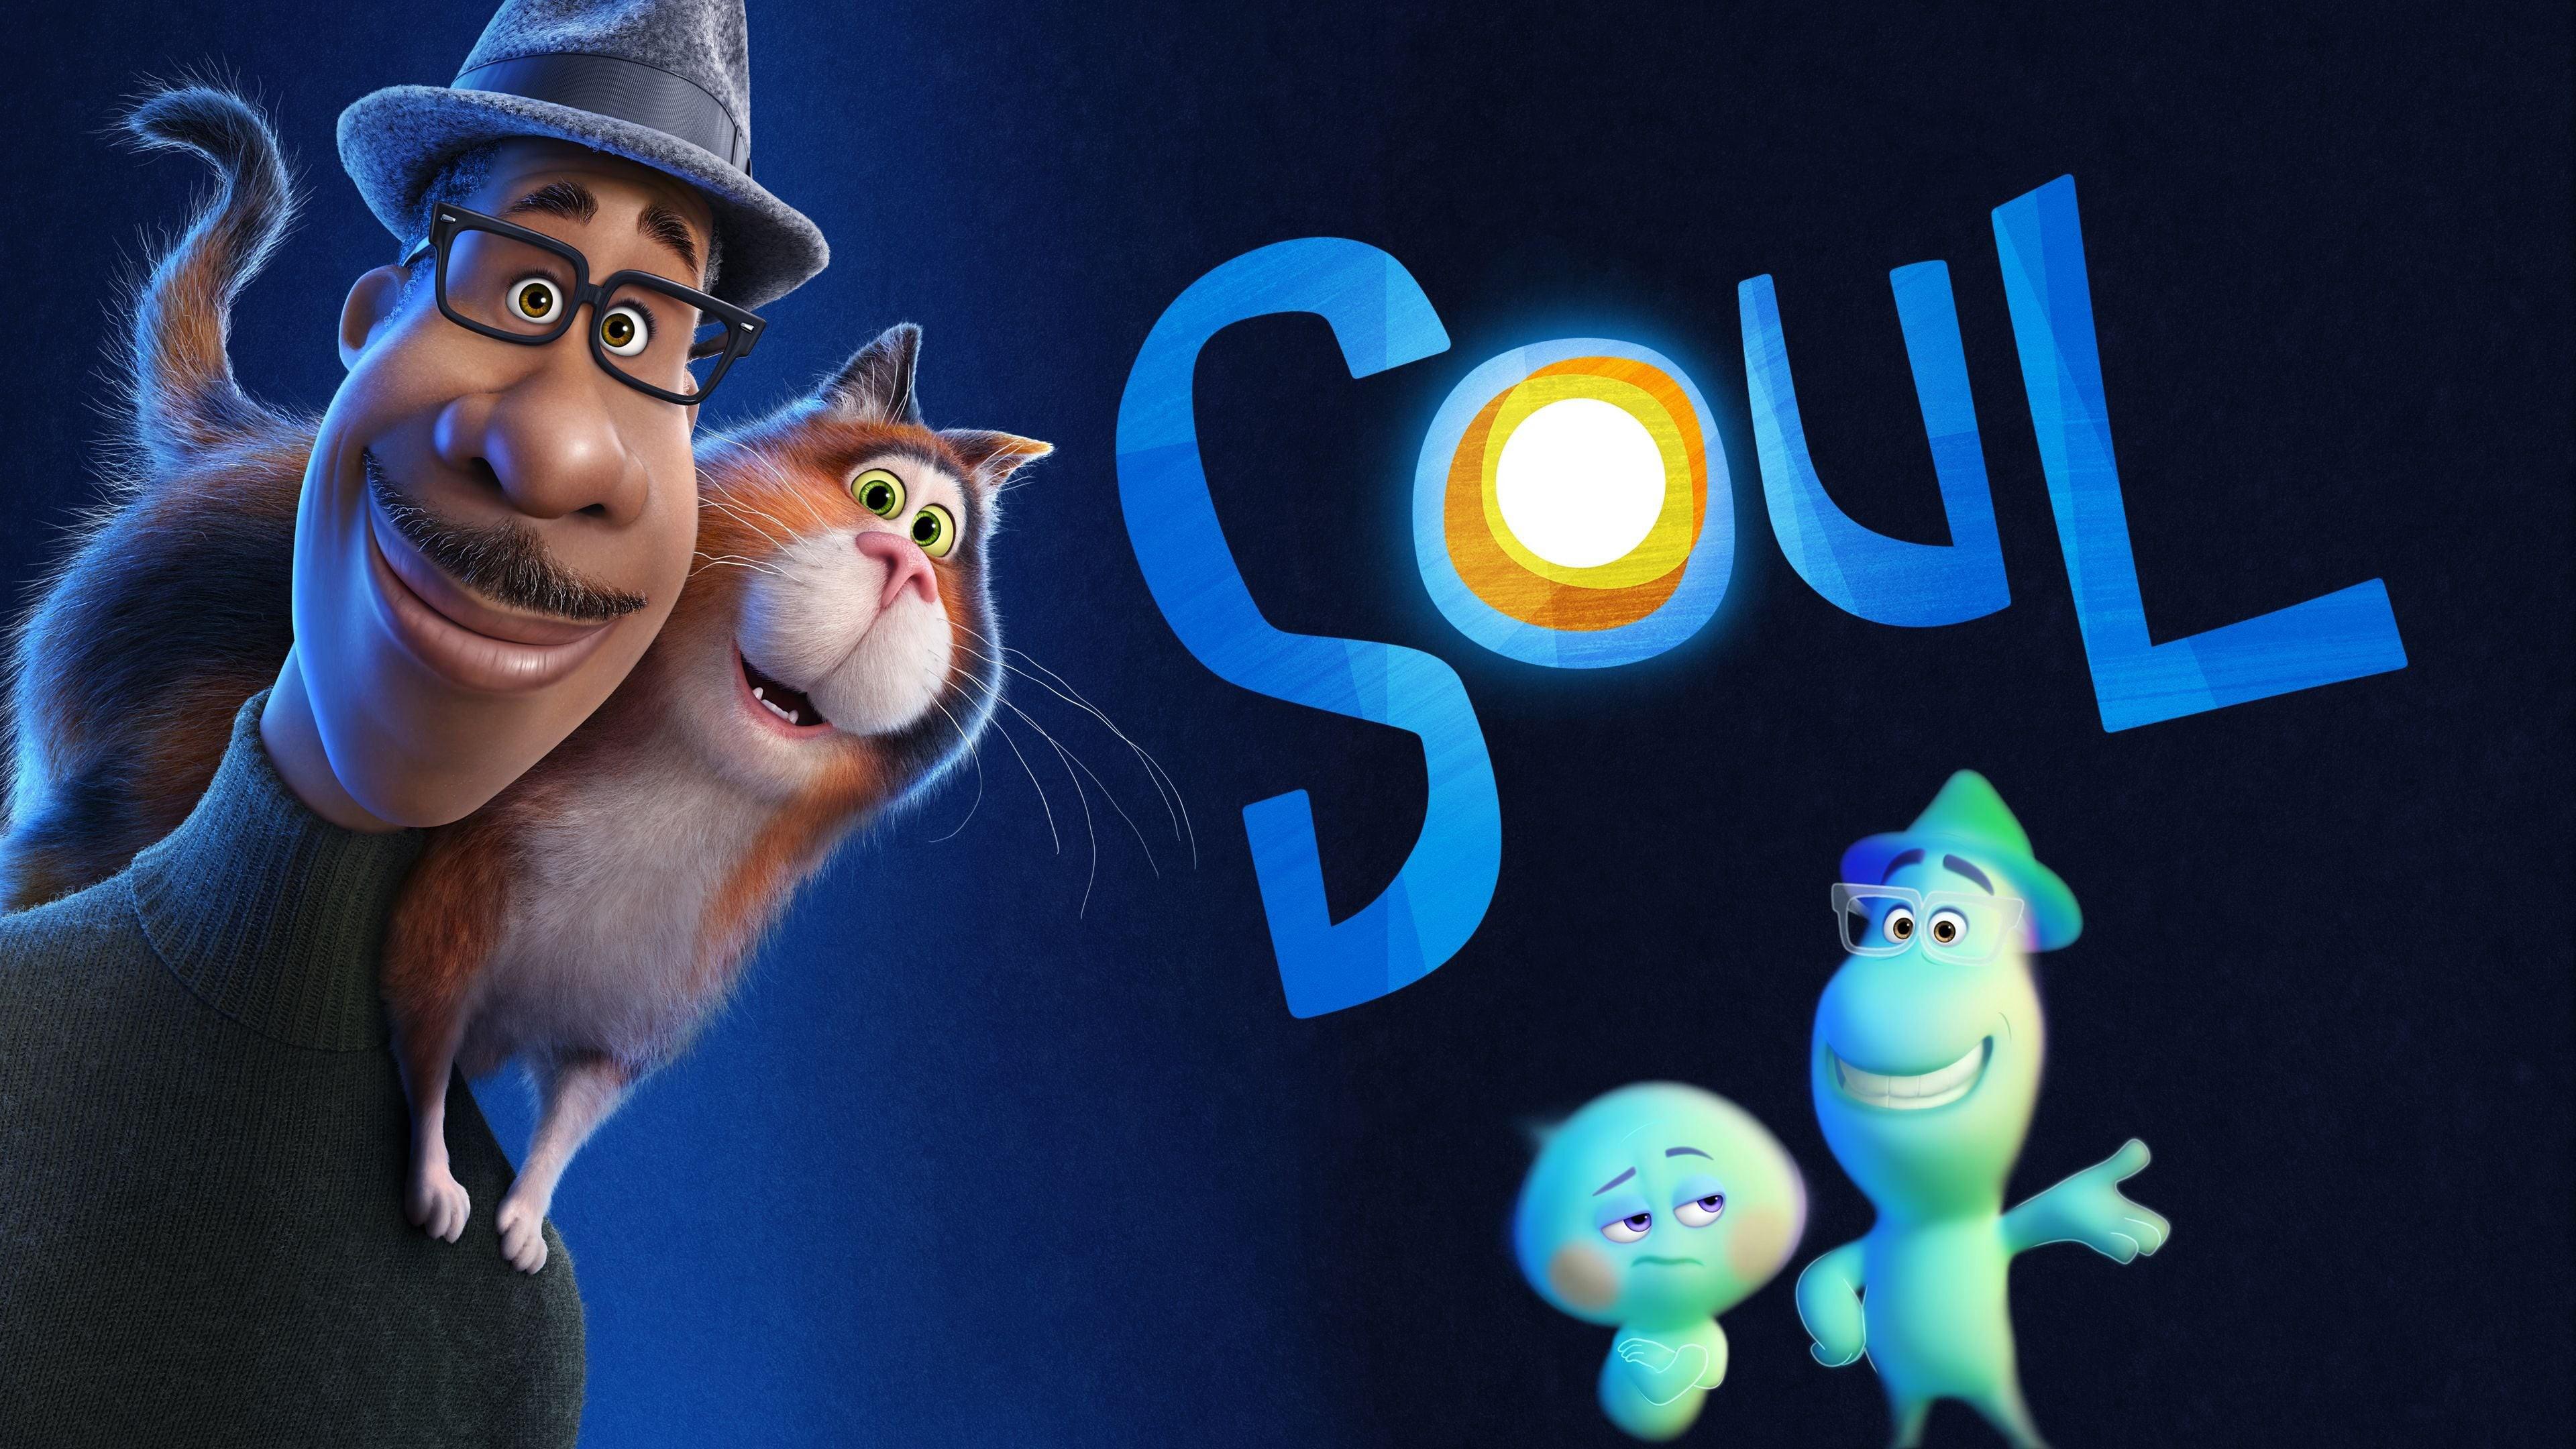 disney soul movie 1612106552 - Disney Soul Movie - Disney Soul Movie wallpapers, Disney Soul Movie 4k wallpapers